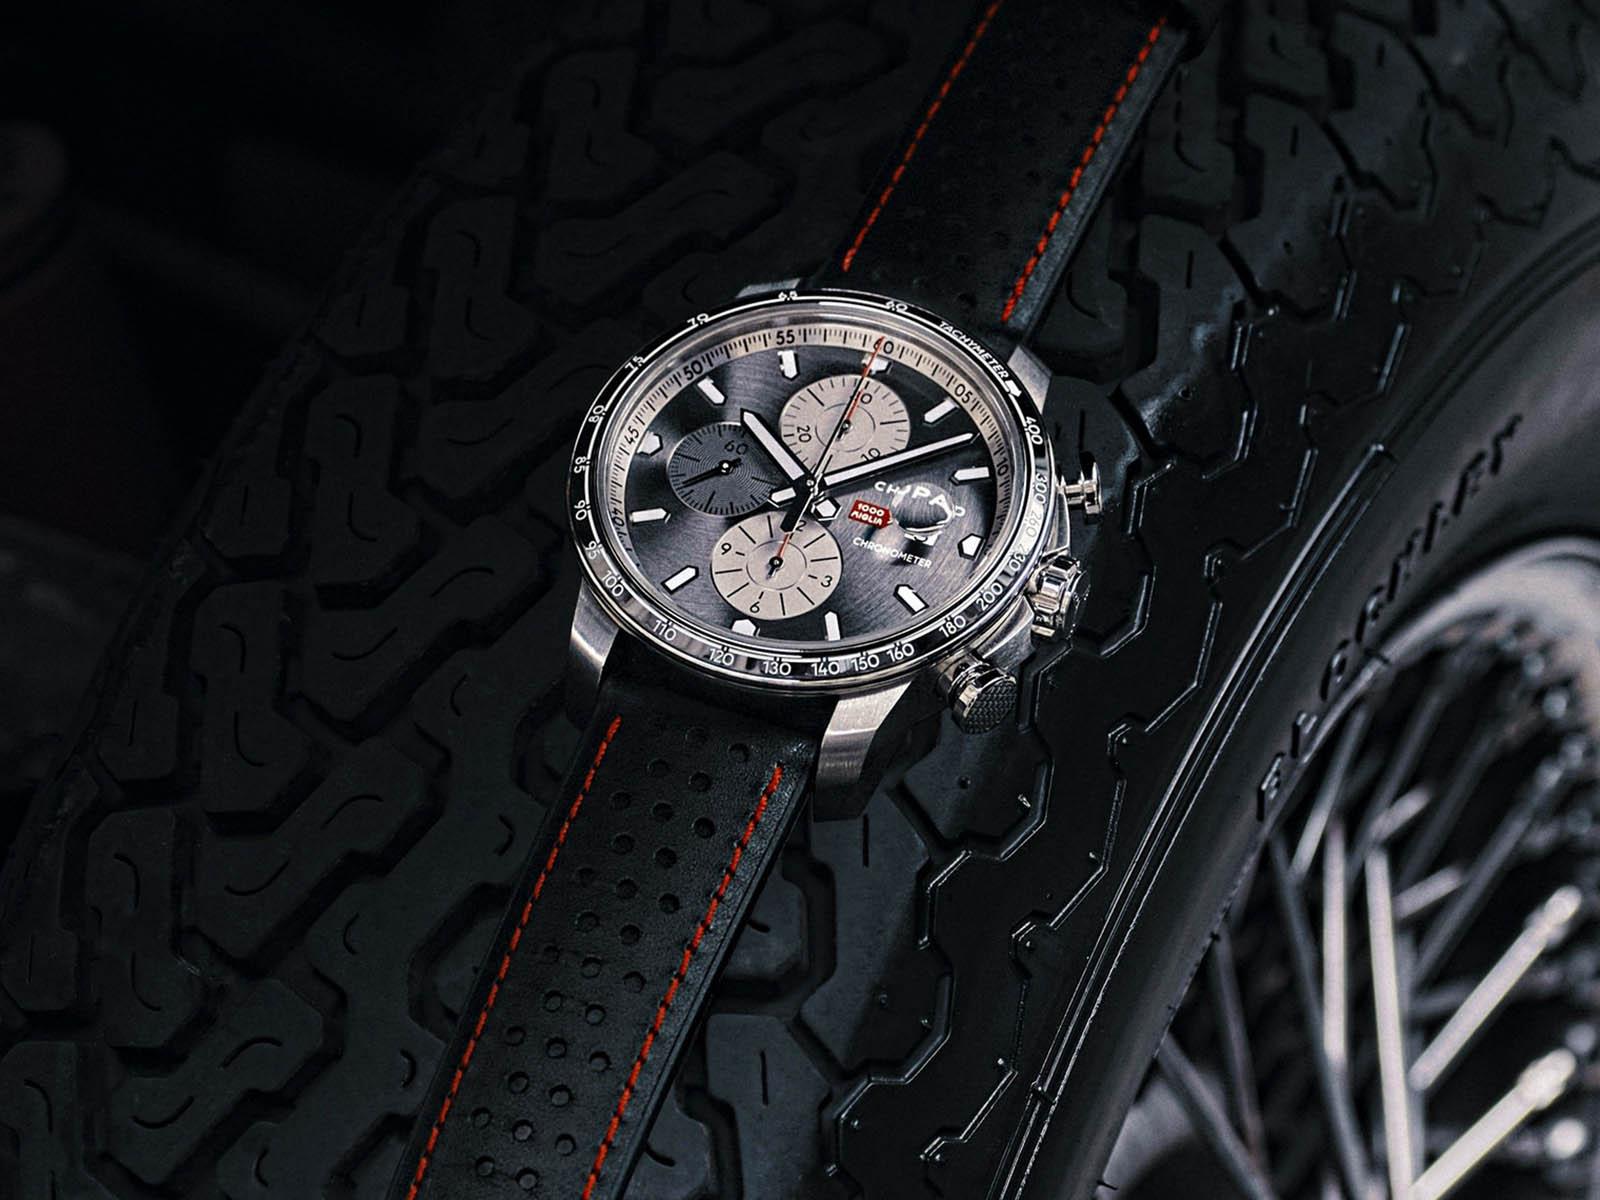 168571-3009-chopard-mille-miglia-race-edition-2021-2.jpg